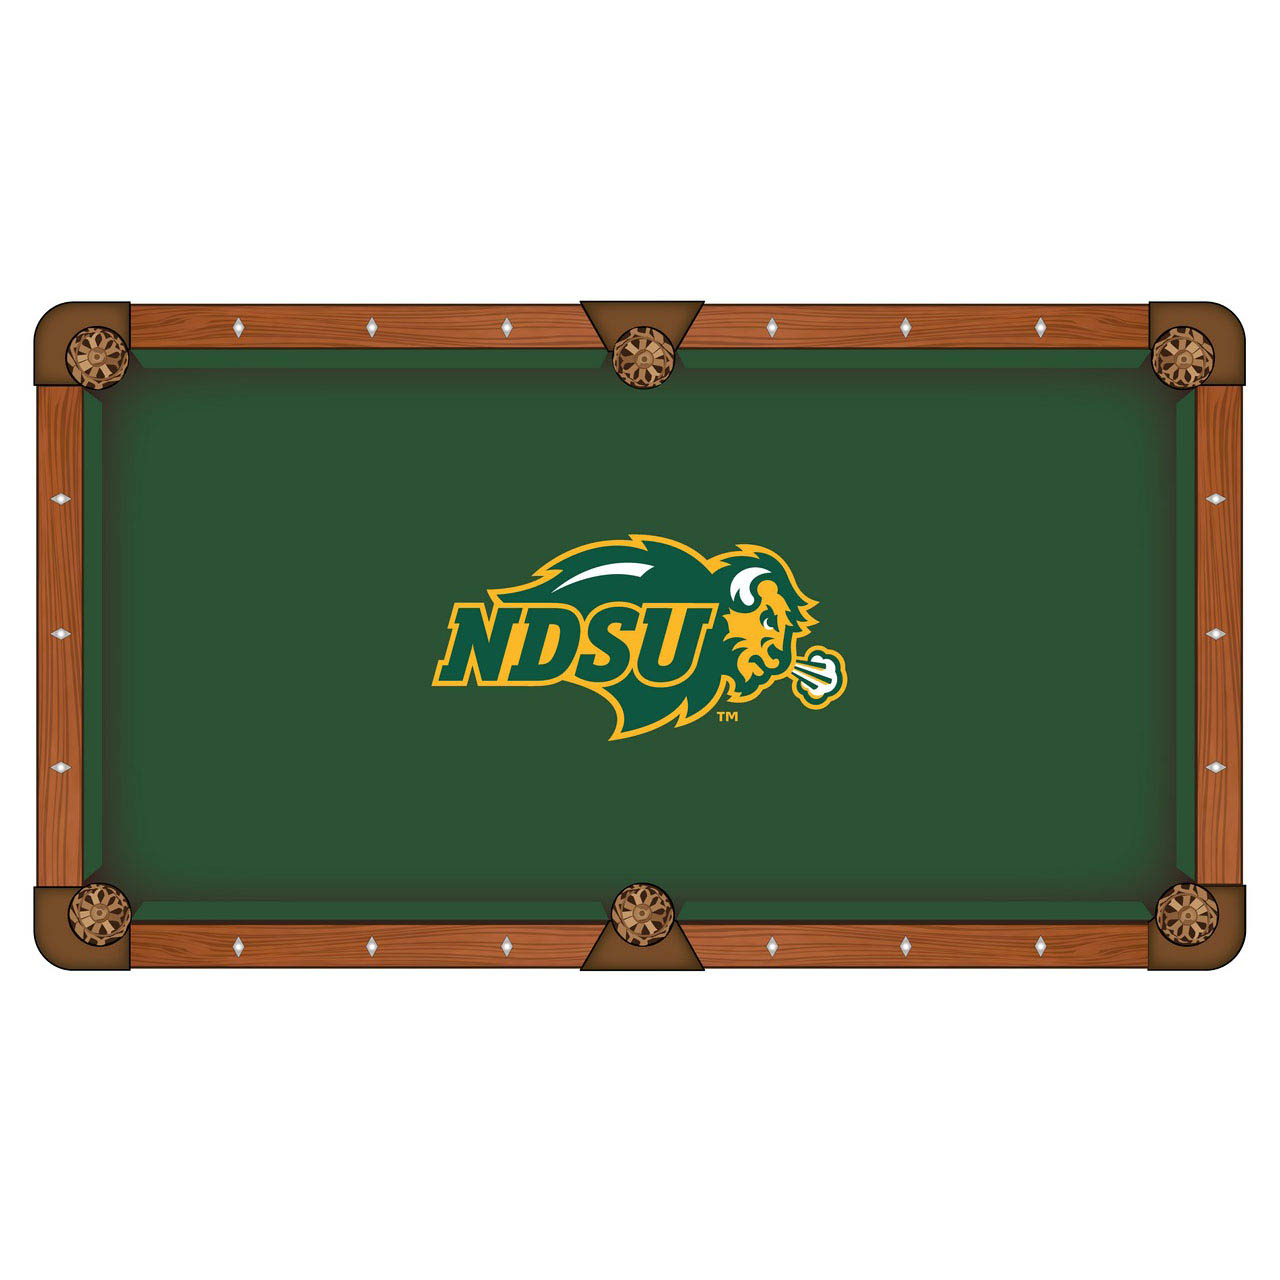 Impressive North Dakota State University Pool Table Cloth Product Photo